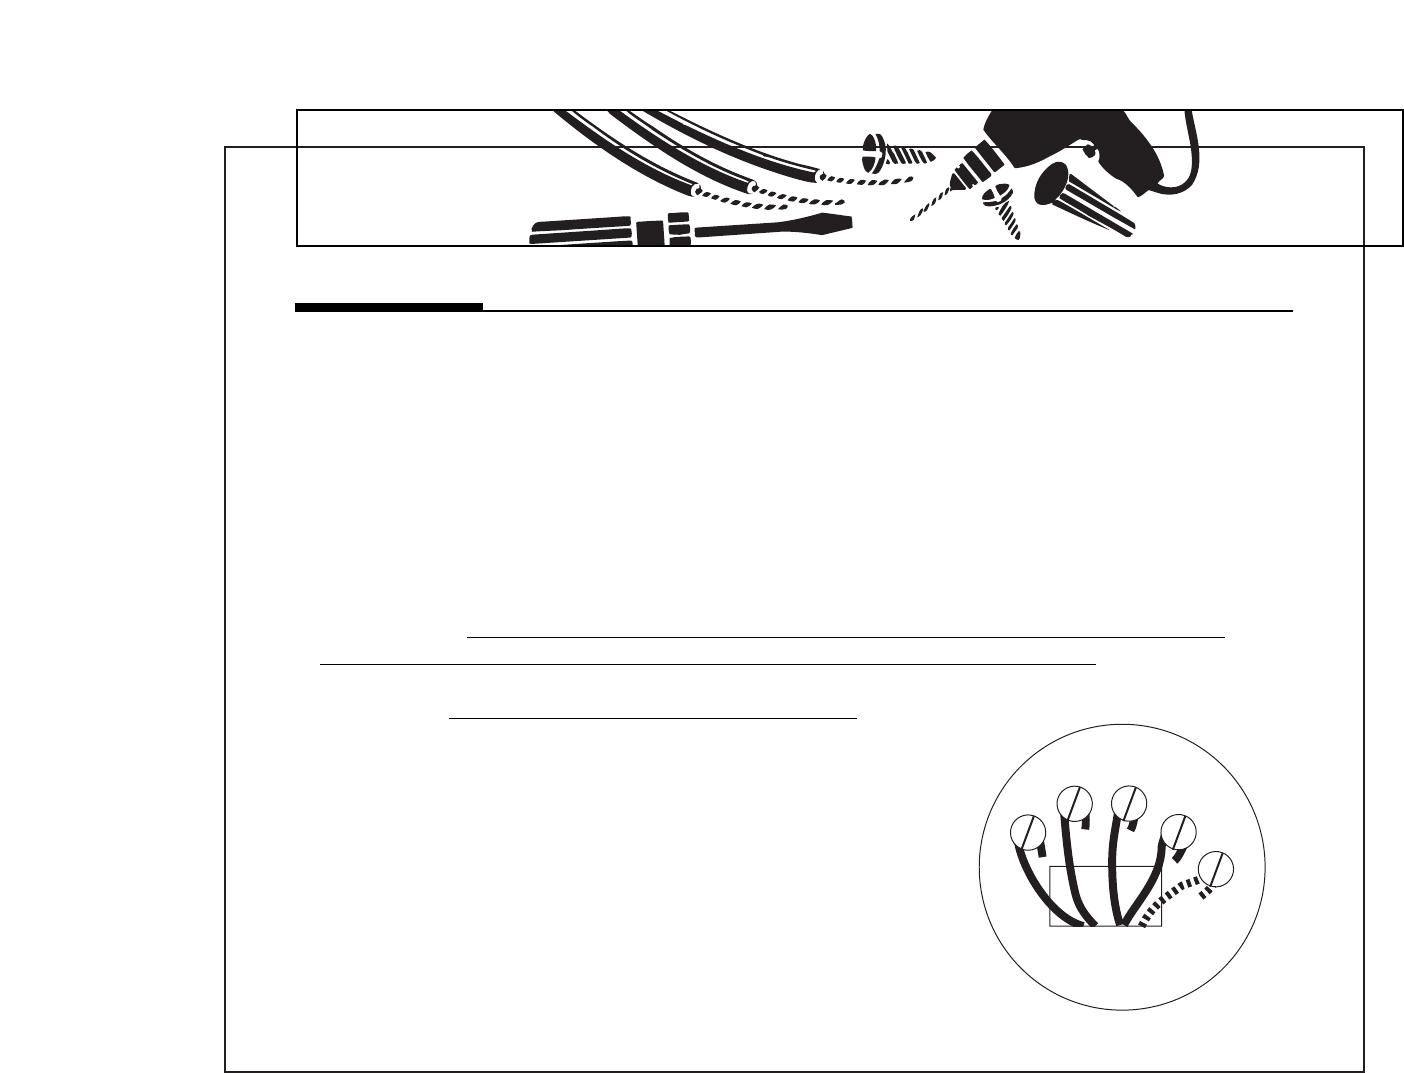 hunter thermostat wiring diagram lx torana v8 44110 cover